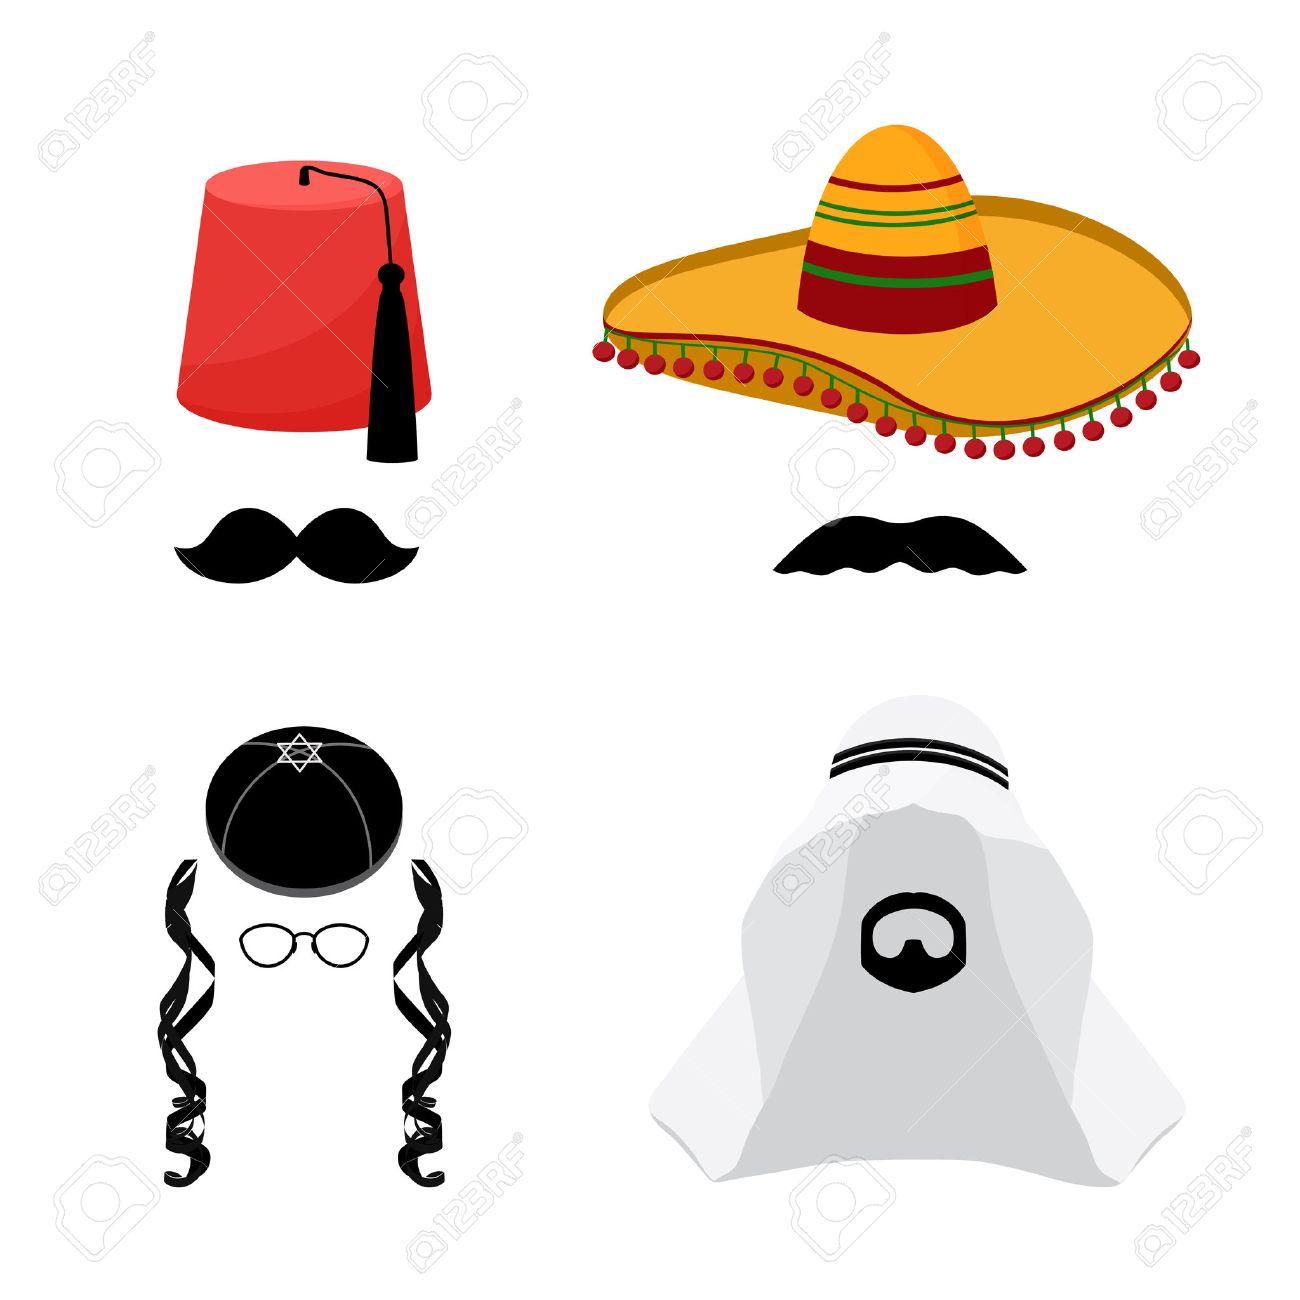 Fez Hat Vector & Photo (Free Trial) | Bigstock